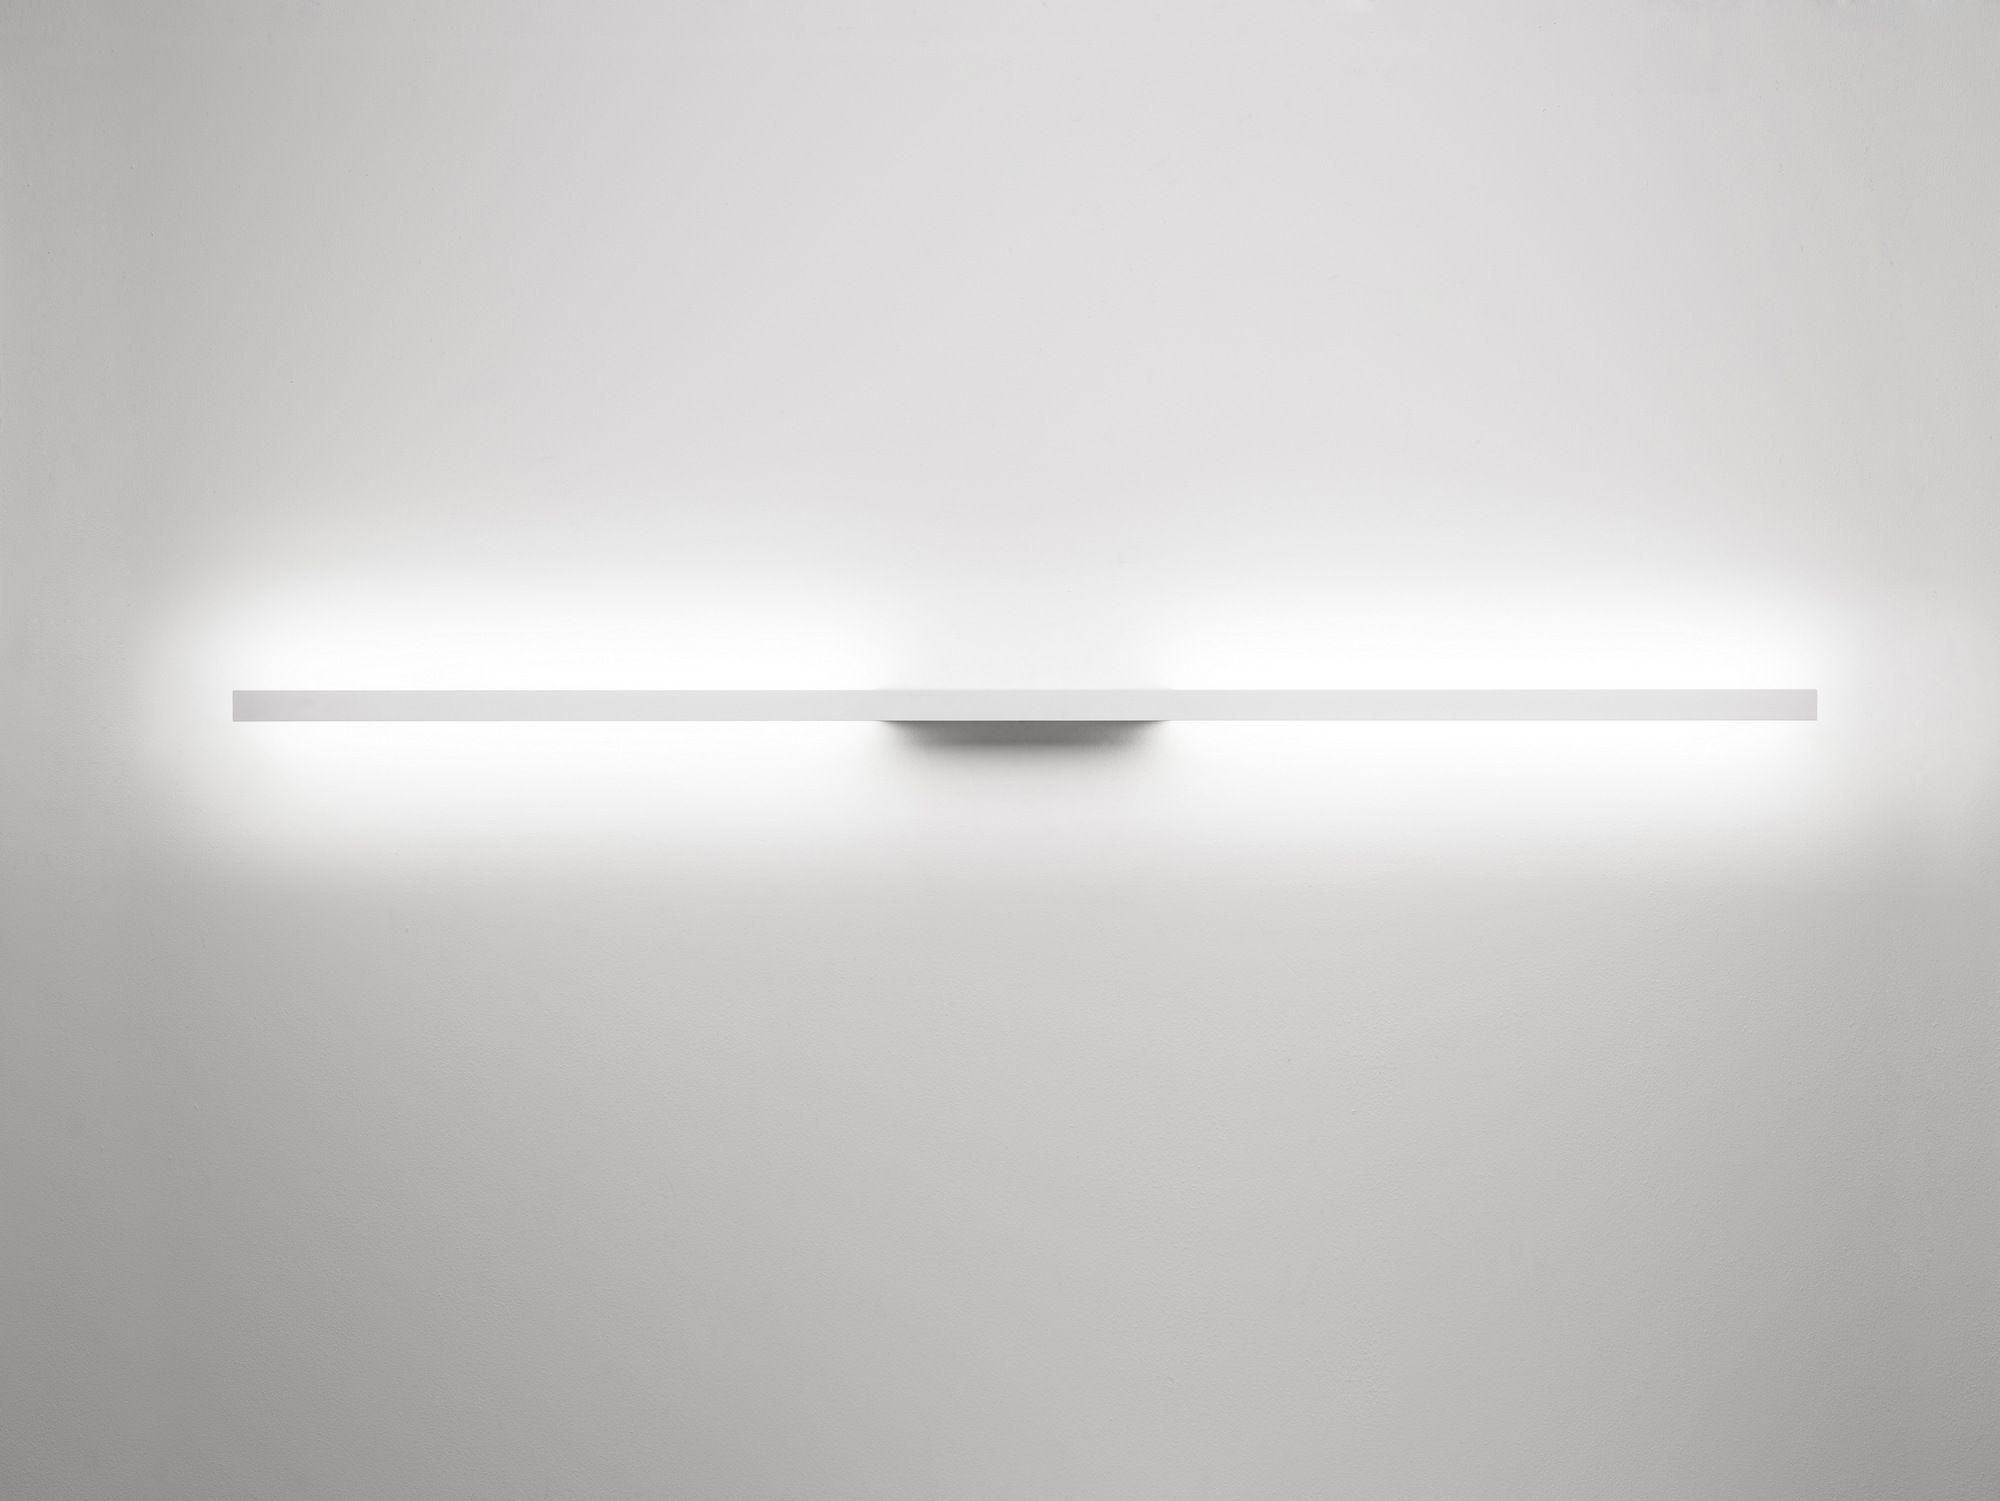 Xilema led wall light by linea light group design edin dedovic lighting design arubaitofo Gallery